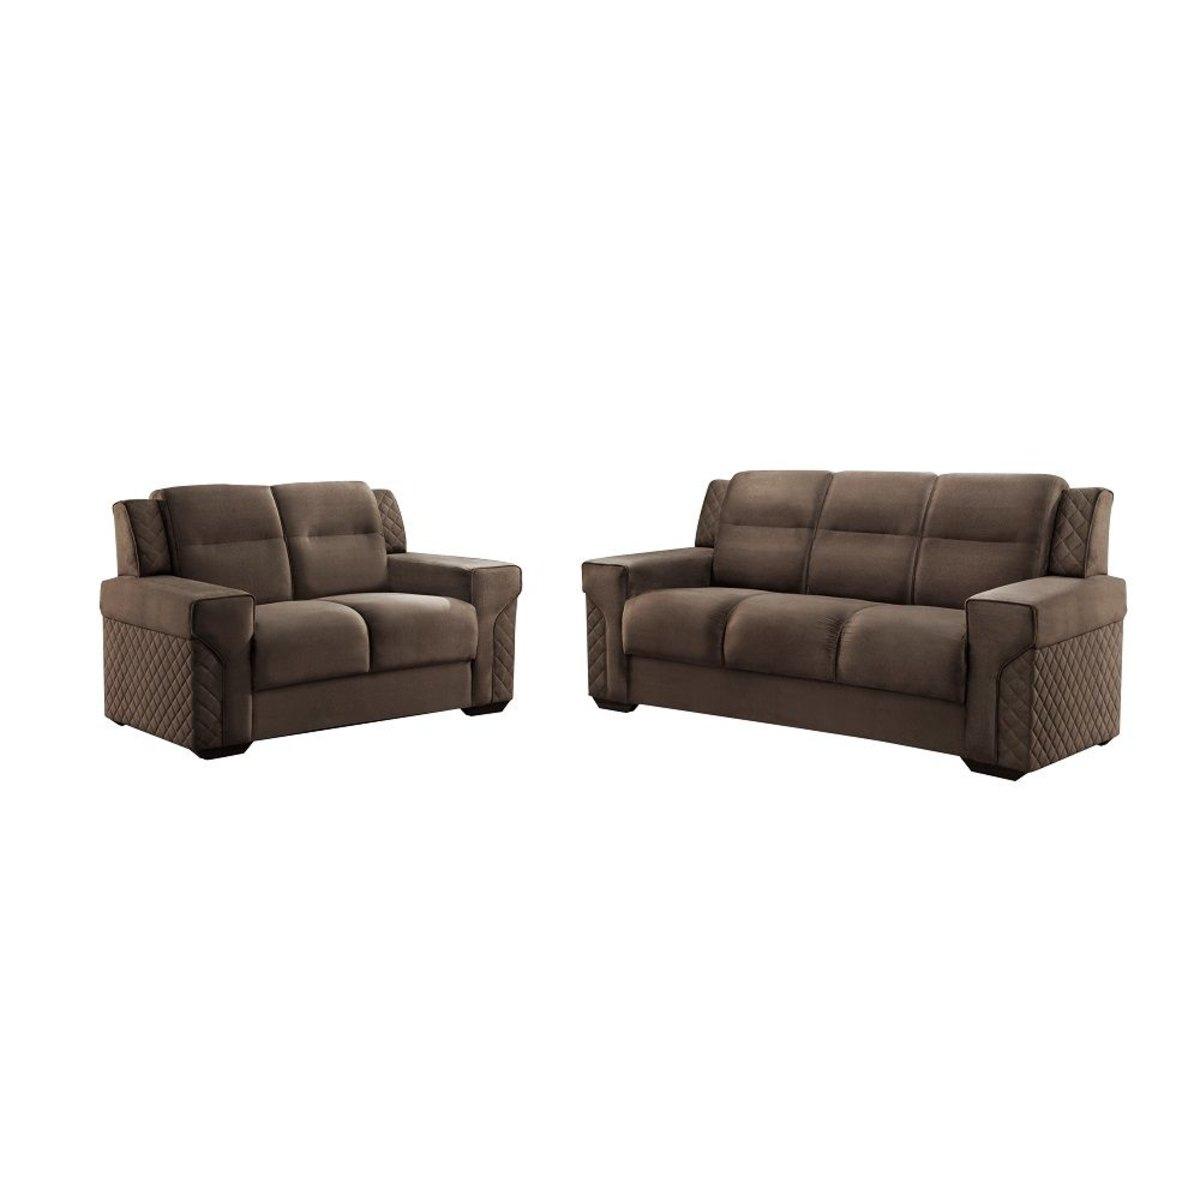 Tecido Animale Marrom Carrefour, Brown Fabric Recliner Sofa Set